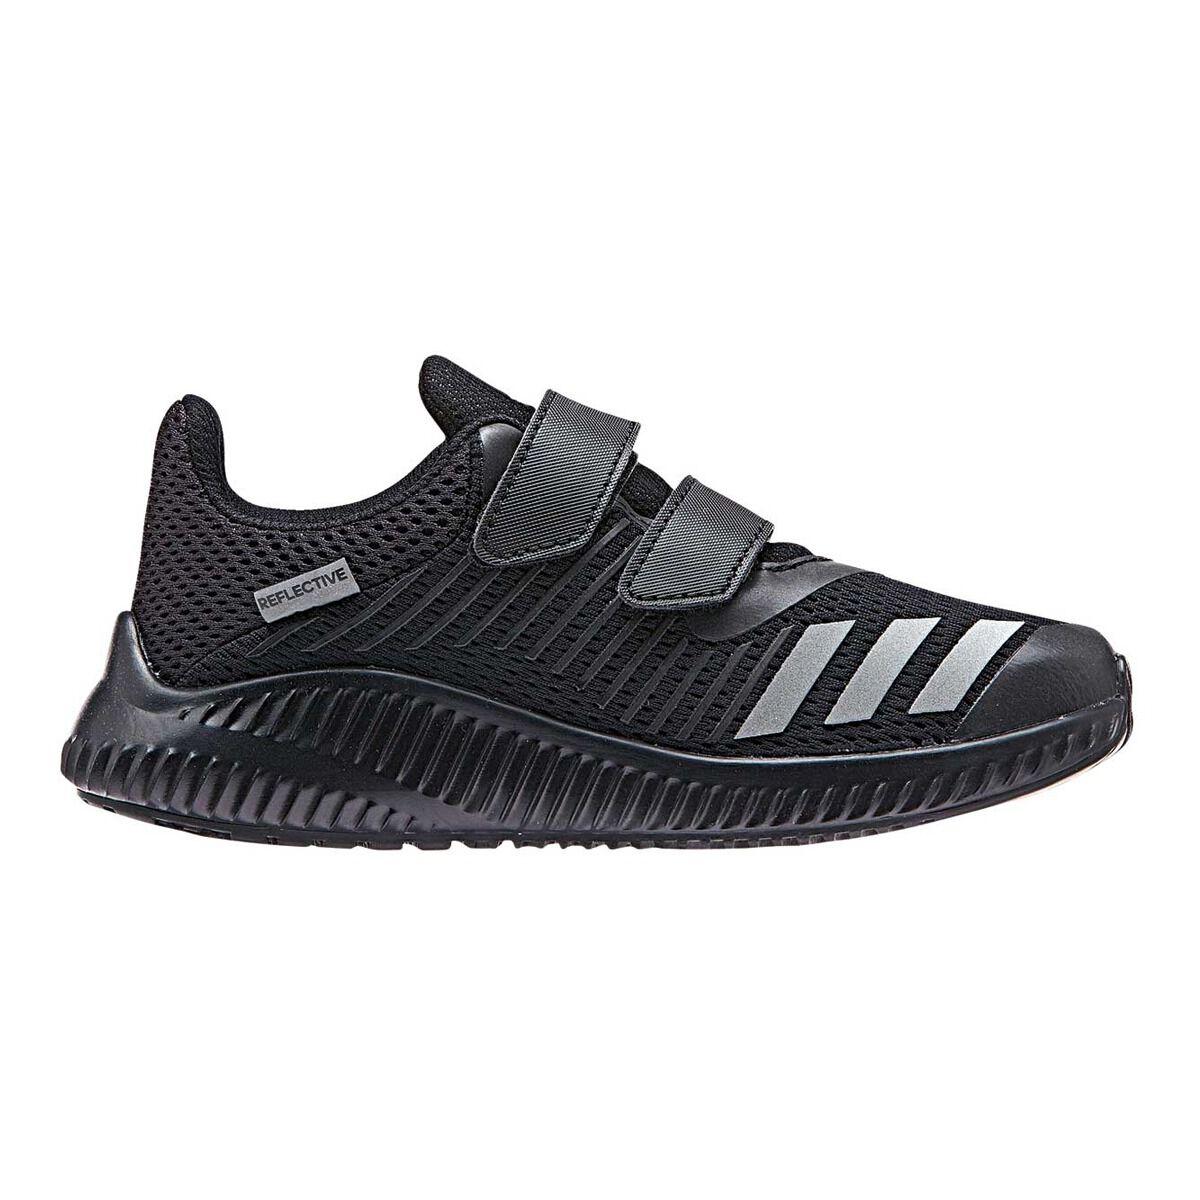 Us Black 1 Rebel Shoes Fortarun Running Adidas Sport Boys nqzOza